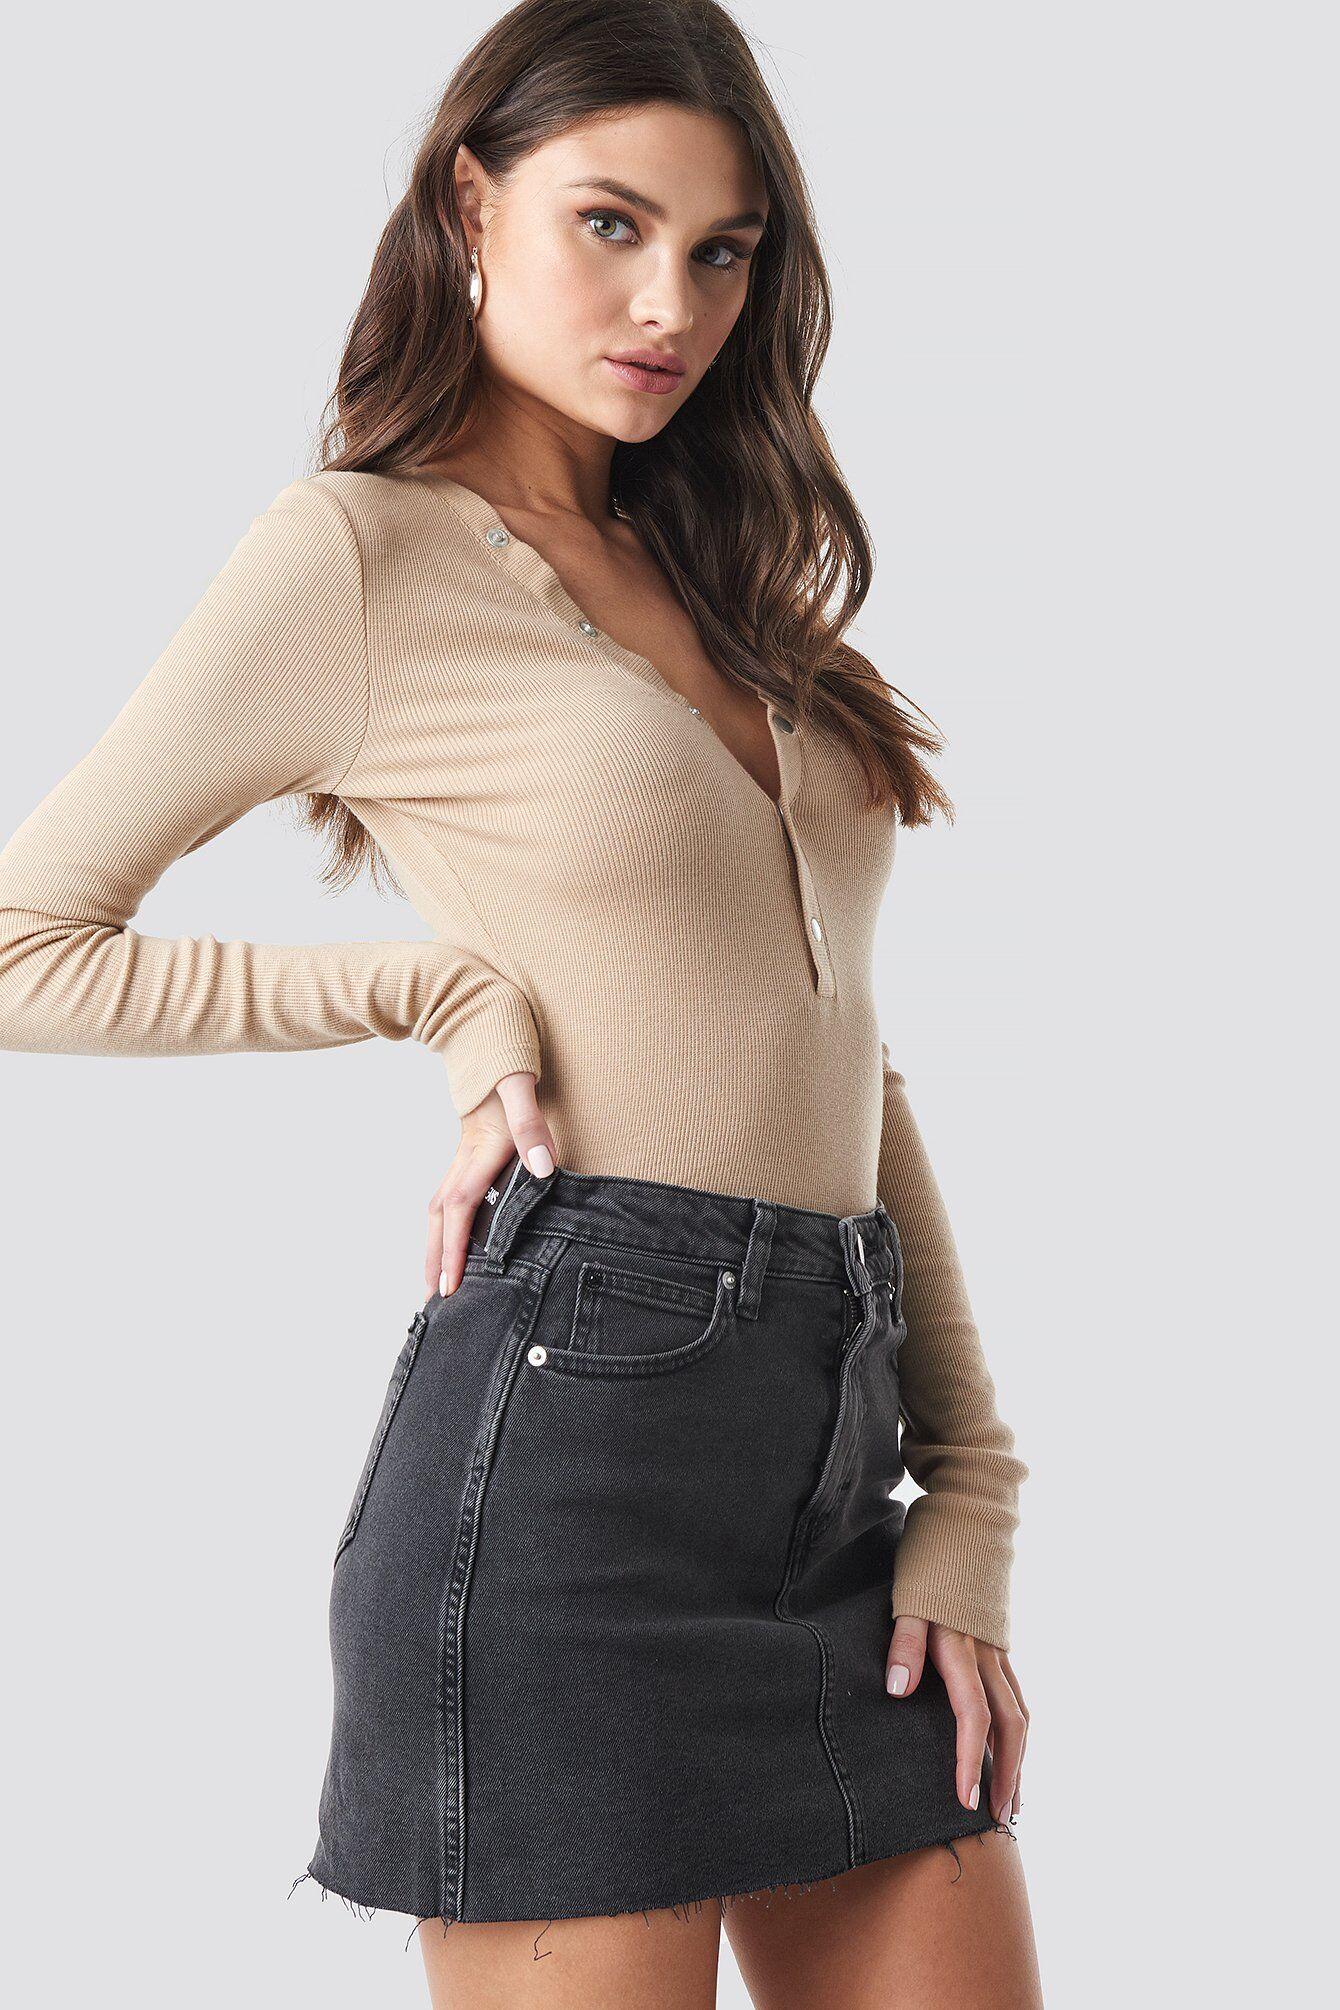 Calvin Klein Mid Rise Skirt - Black,Grey